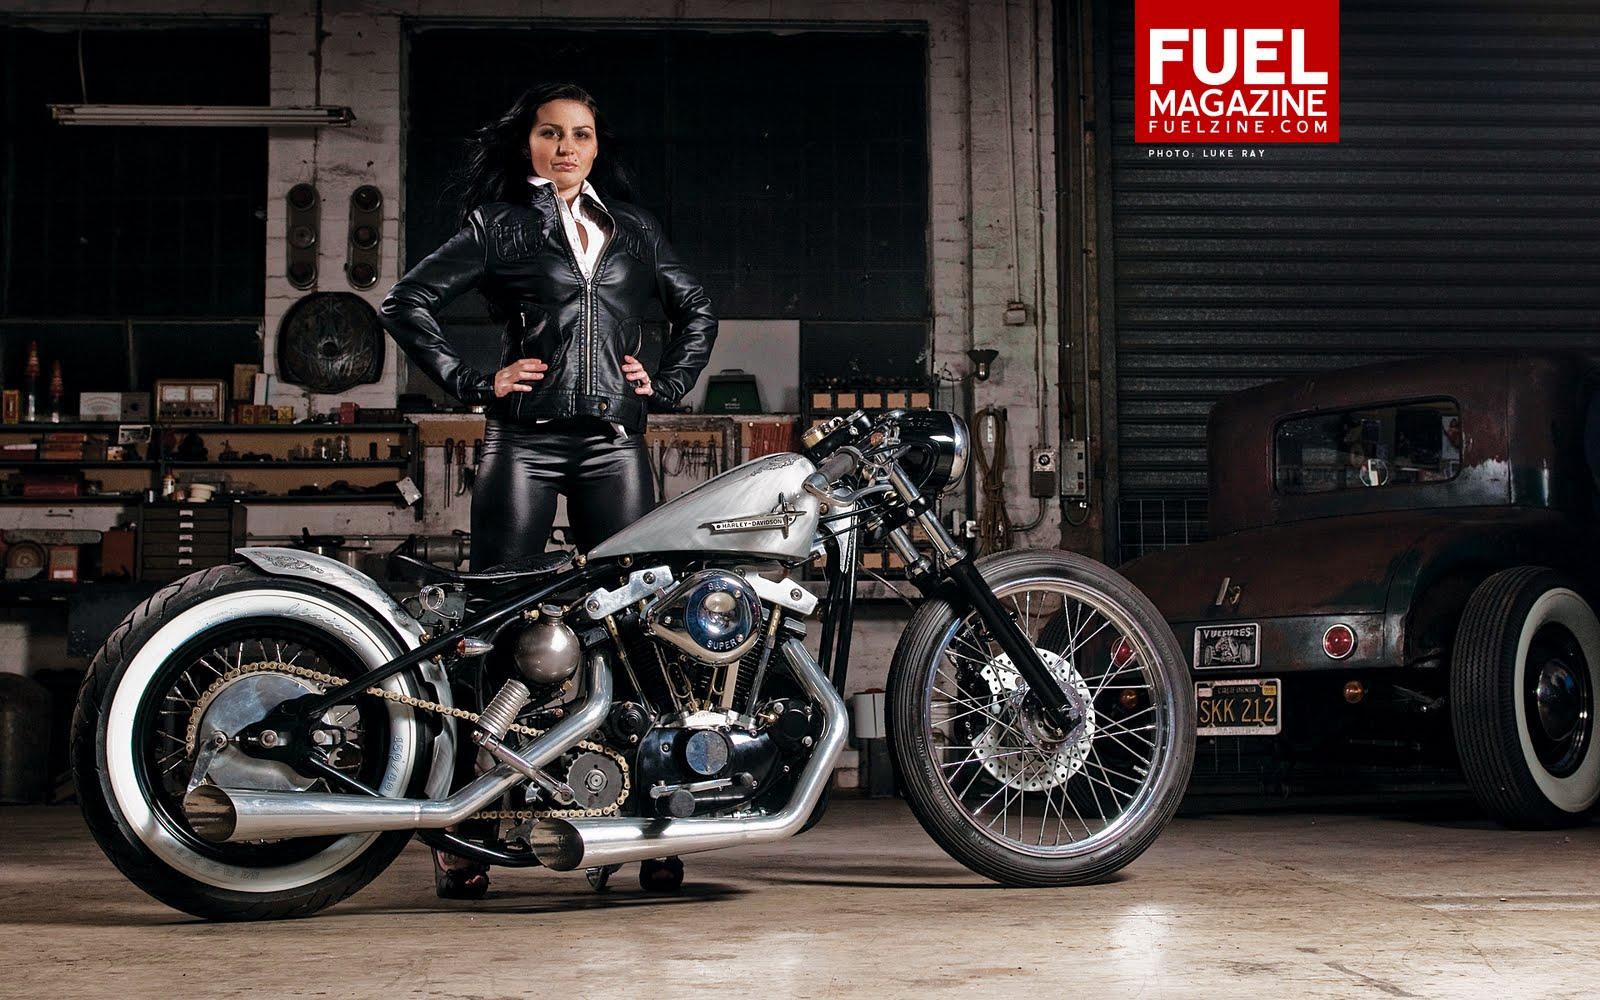 fuel magazines killer desktop rusty knuckles motors. Black Bedroom Furniture Sets. Home Design Ideas